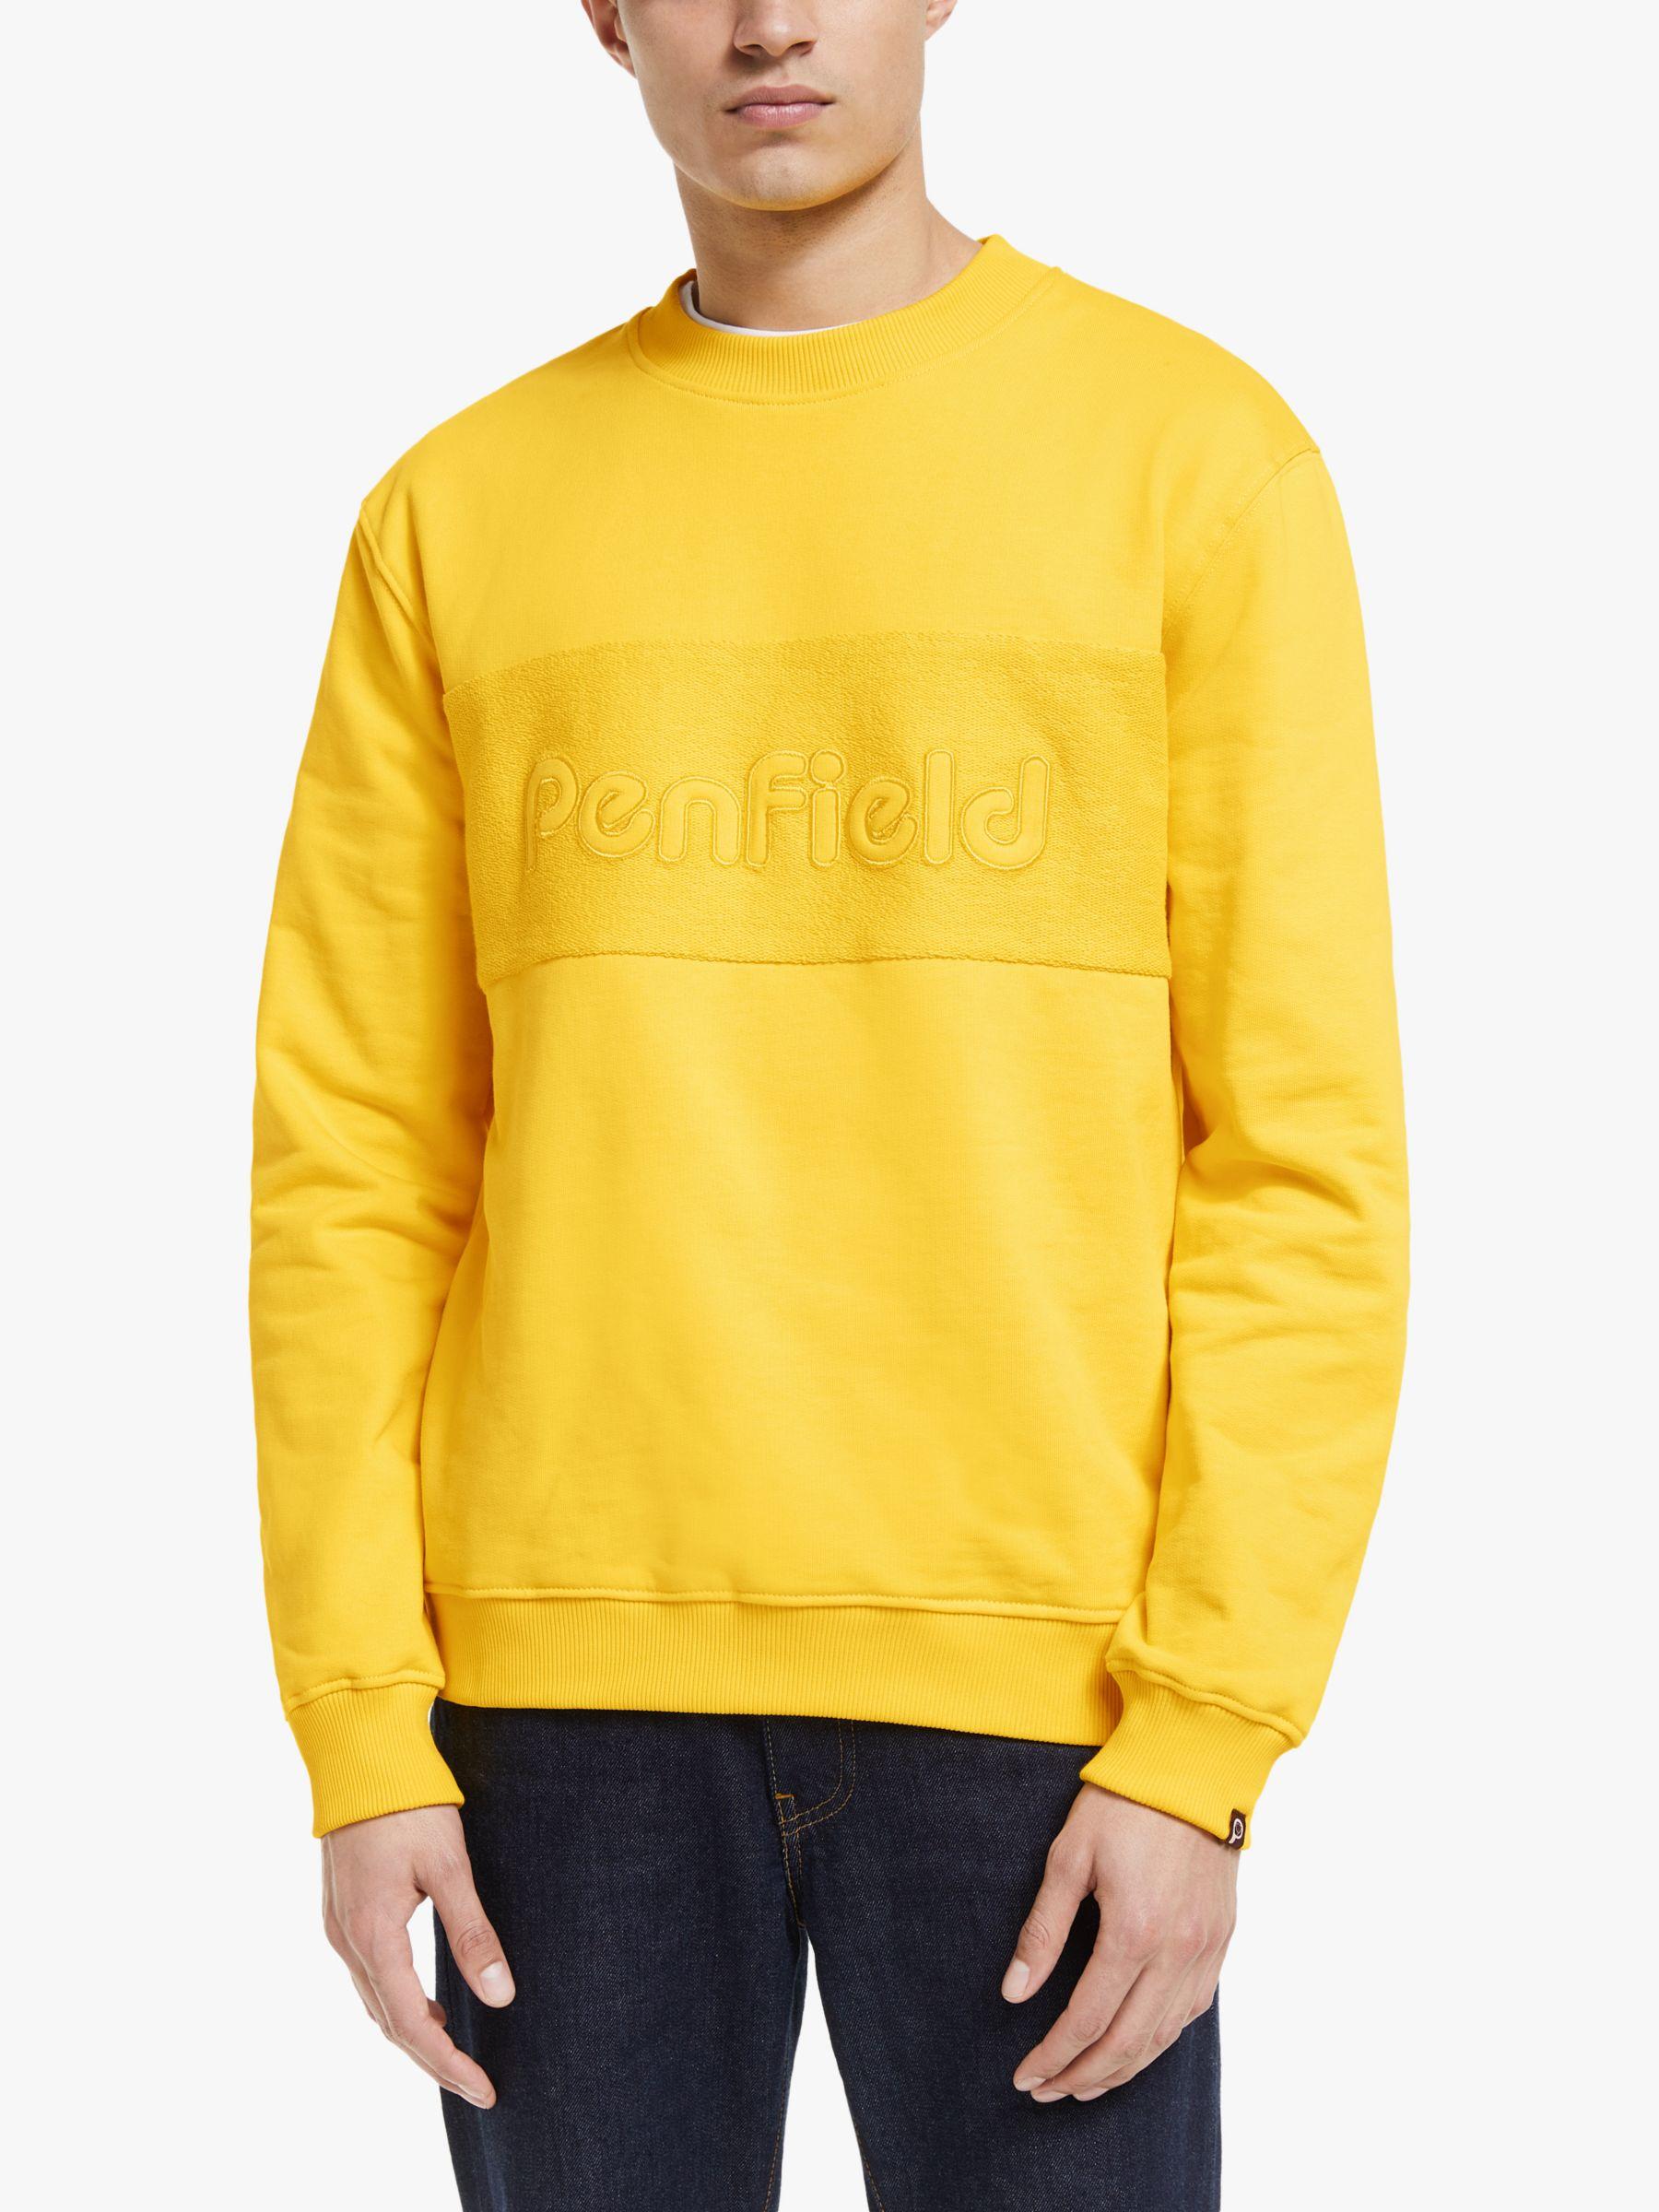 Penfield Penfield Thorndike Crew Sweatshirt, Freesia Yellow